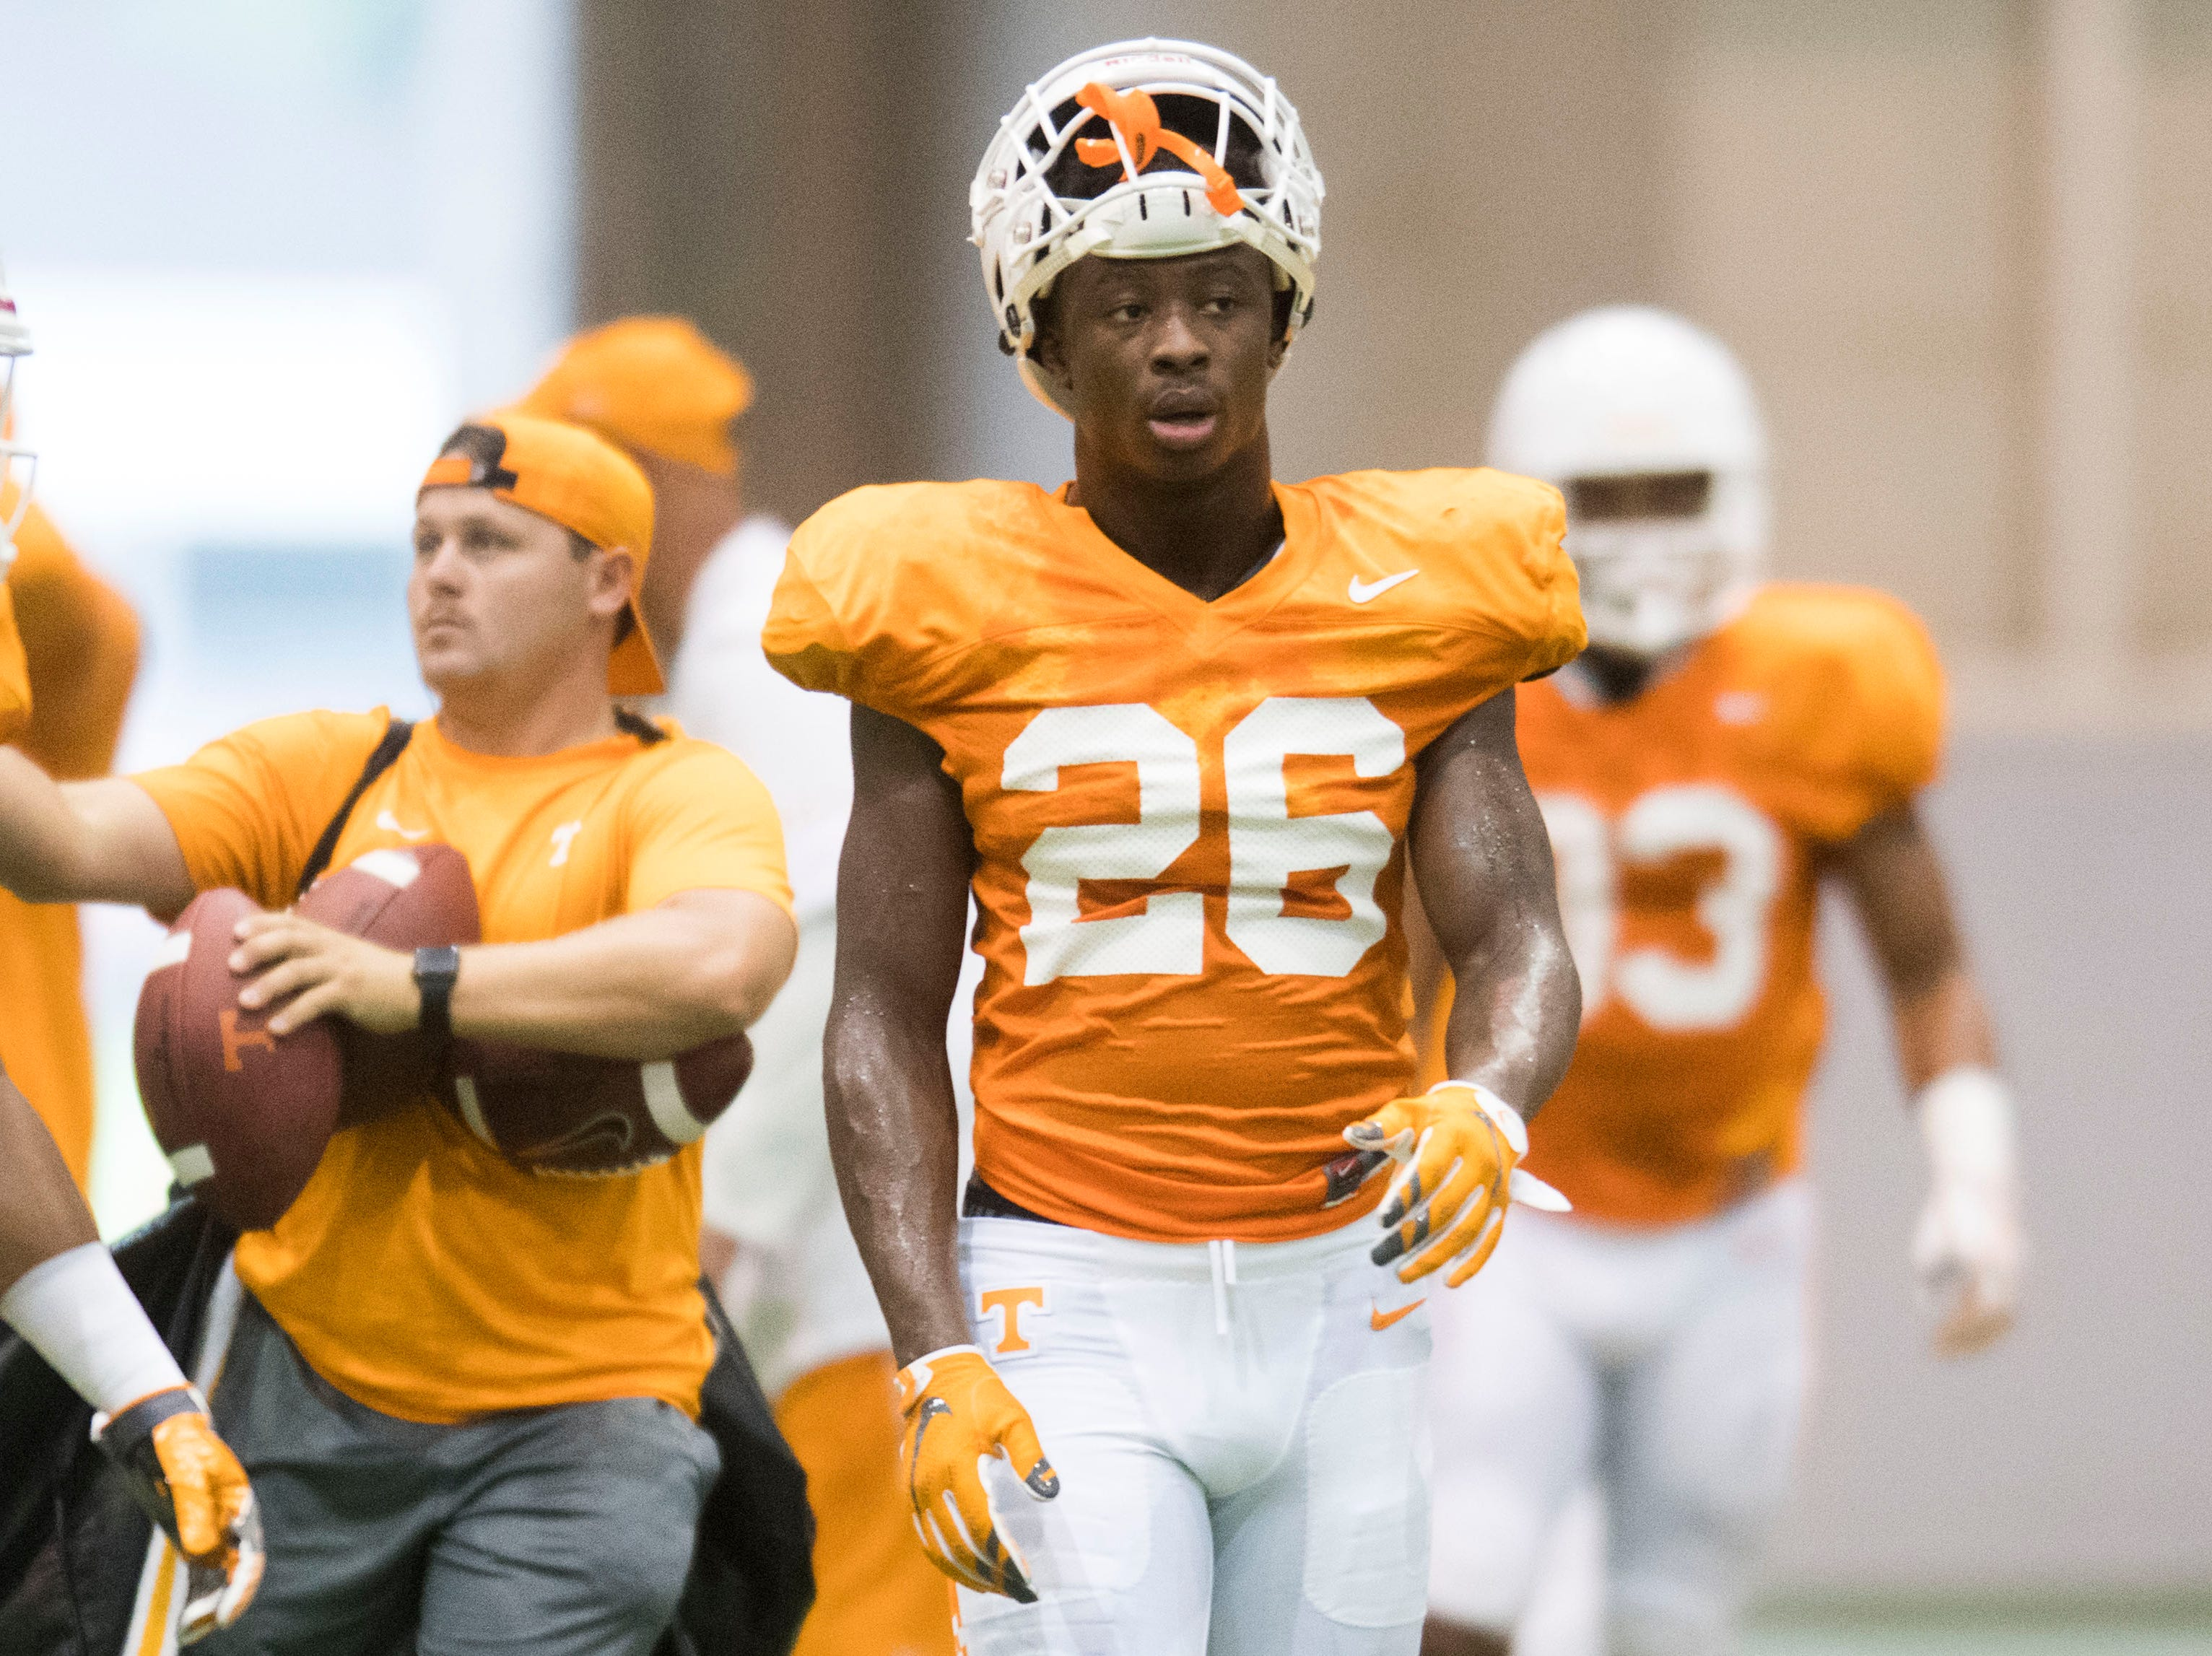 Tennessee defensive back Theo Jackson (26) walks on the field during UT Vols preseason football practice Wednesday, Aug. 8, 2018.